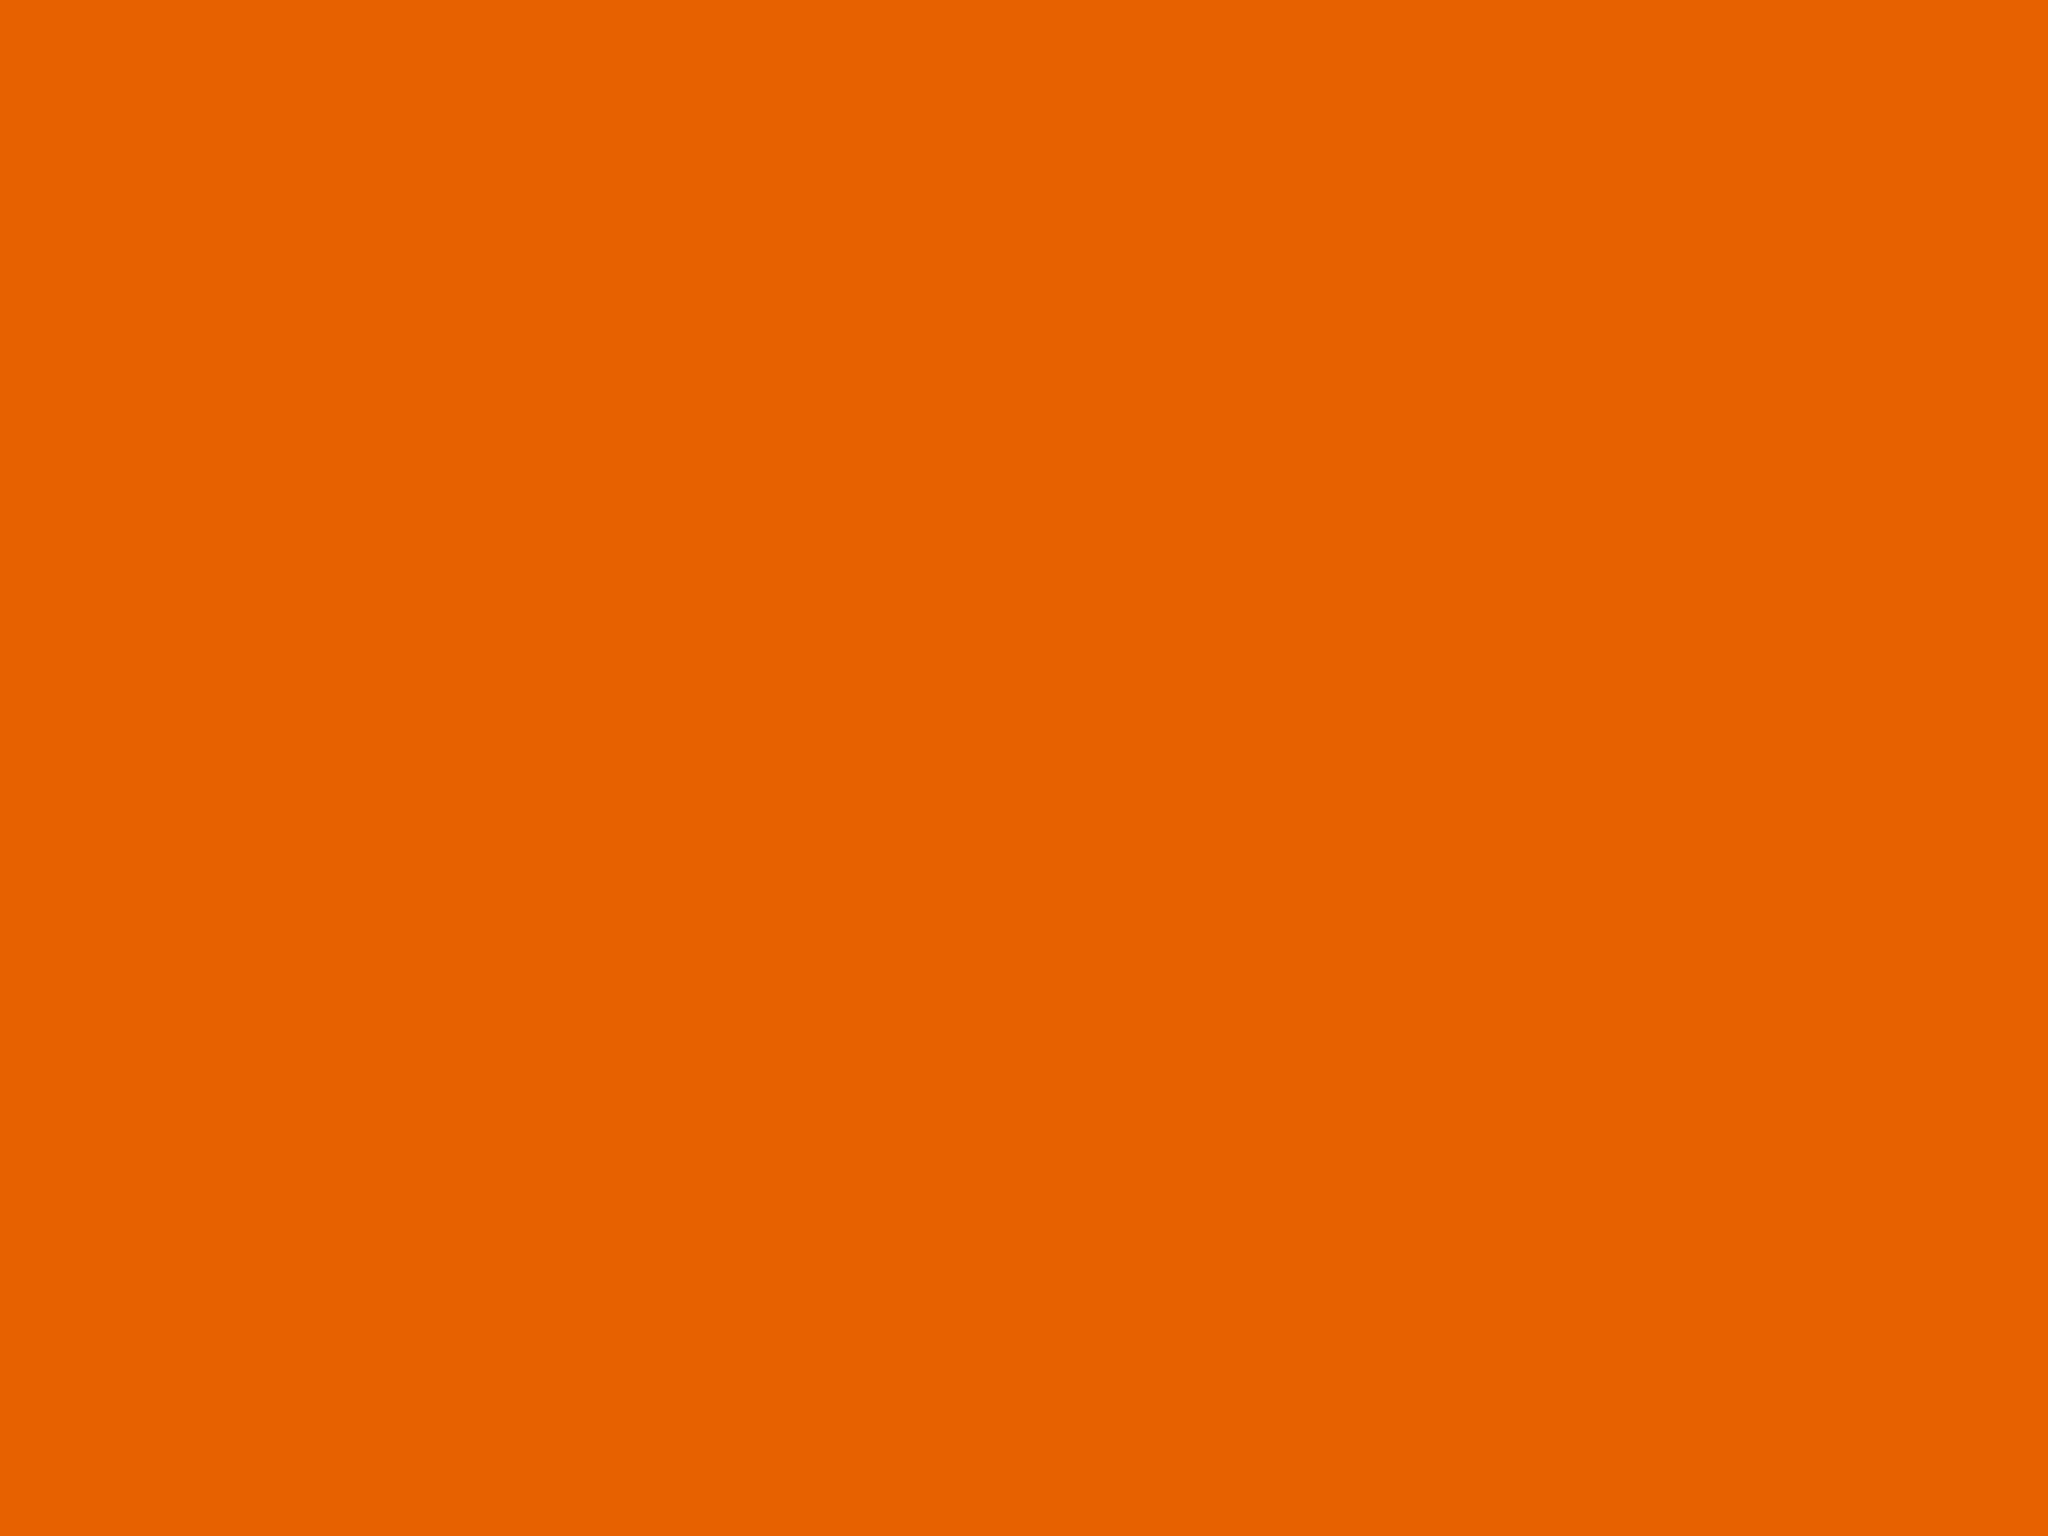 2048x1536 Spanish Orange Solid Color Background